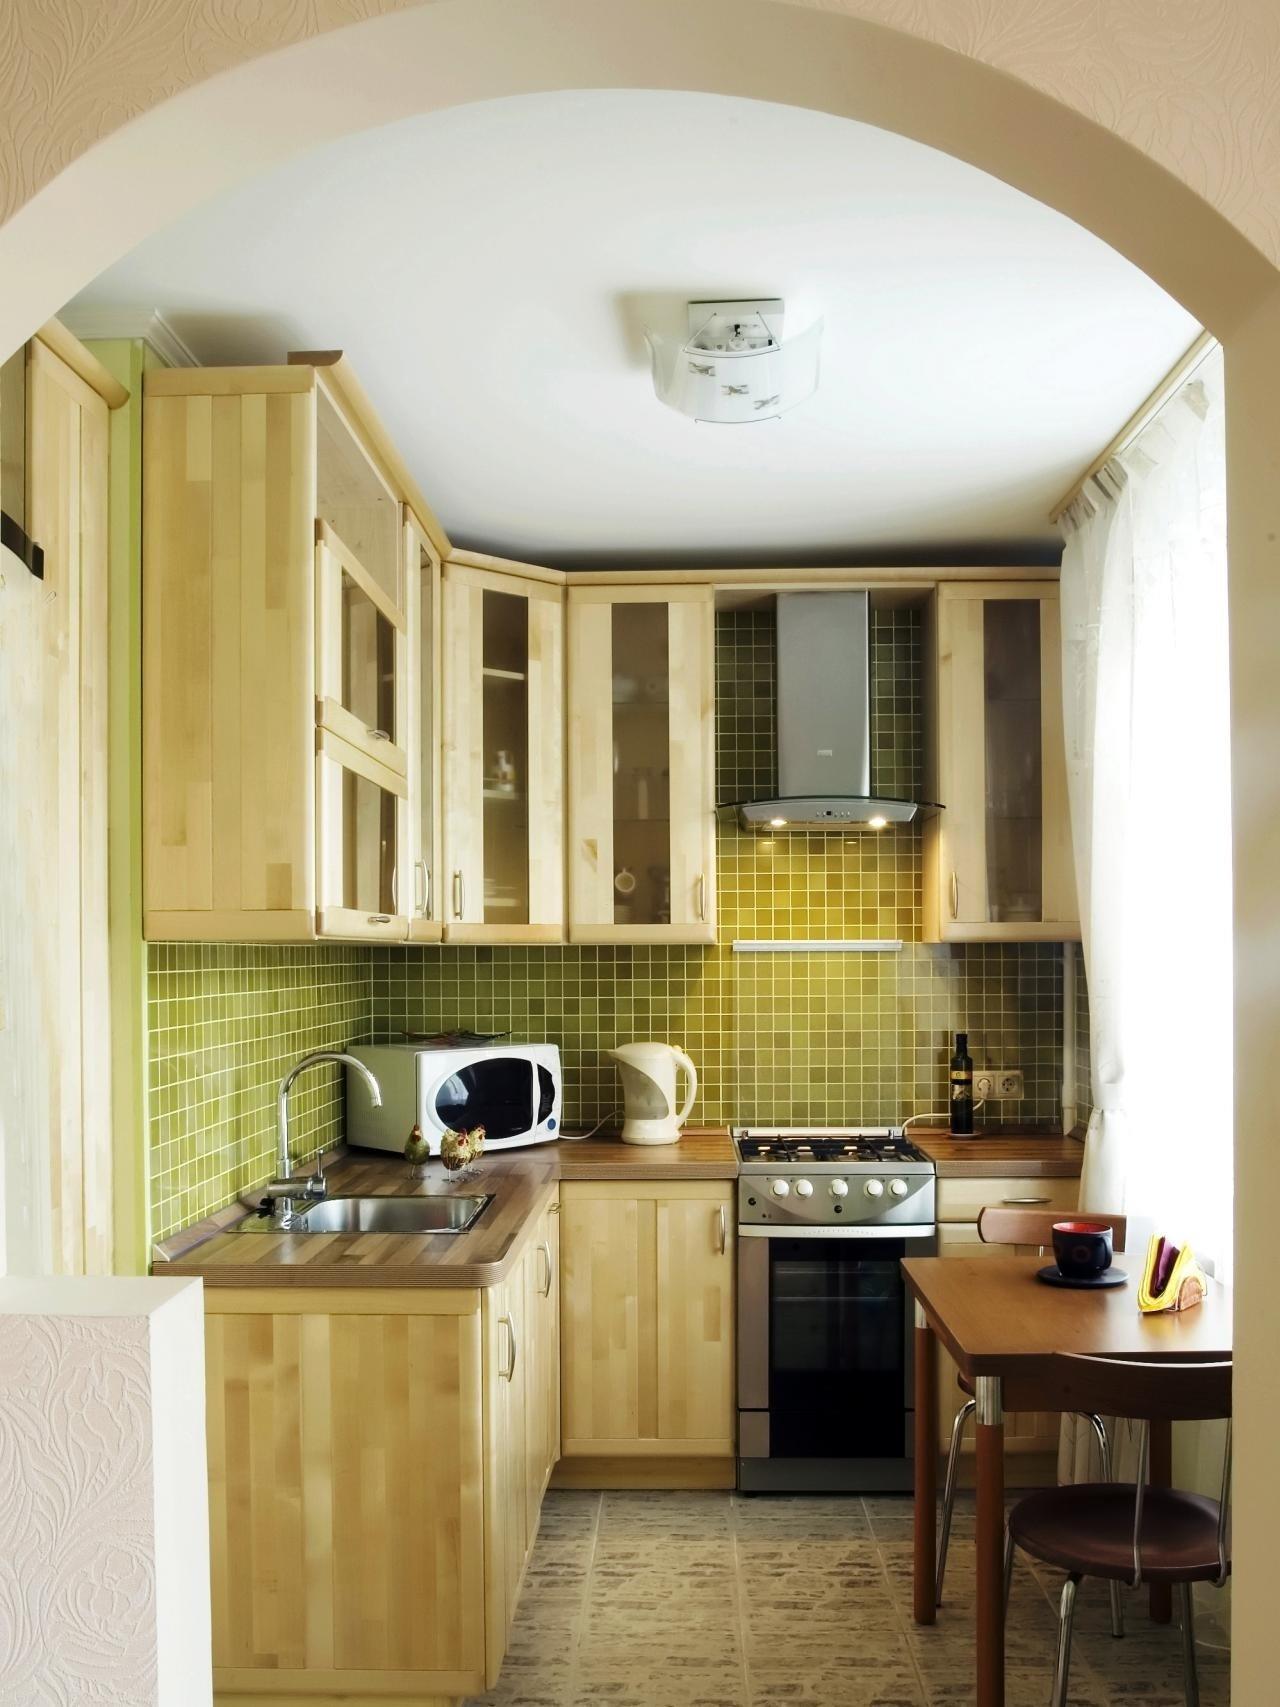 10 Ideal Kitchen Design Ideas For Small Kitchens kitchen design ideas for small spaces kitchen and decor 1 2020